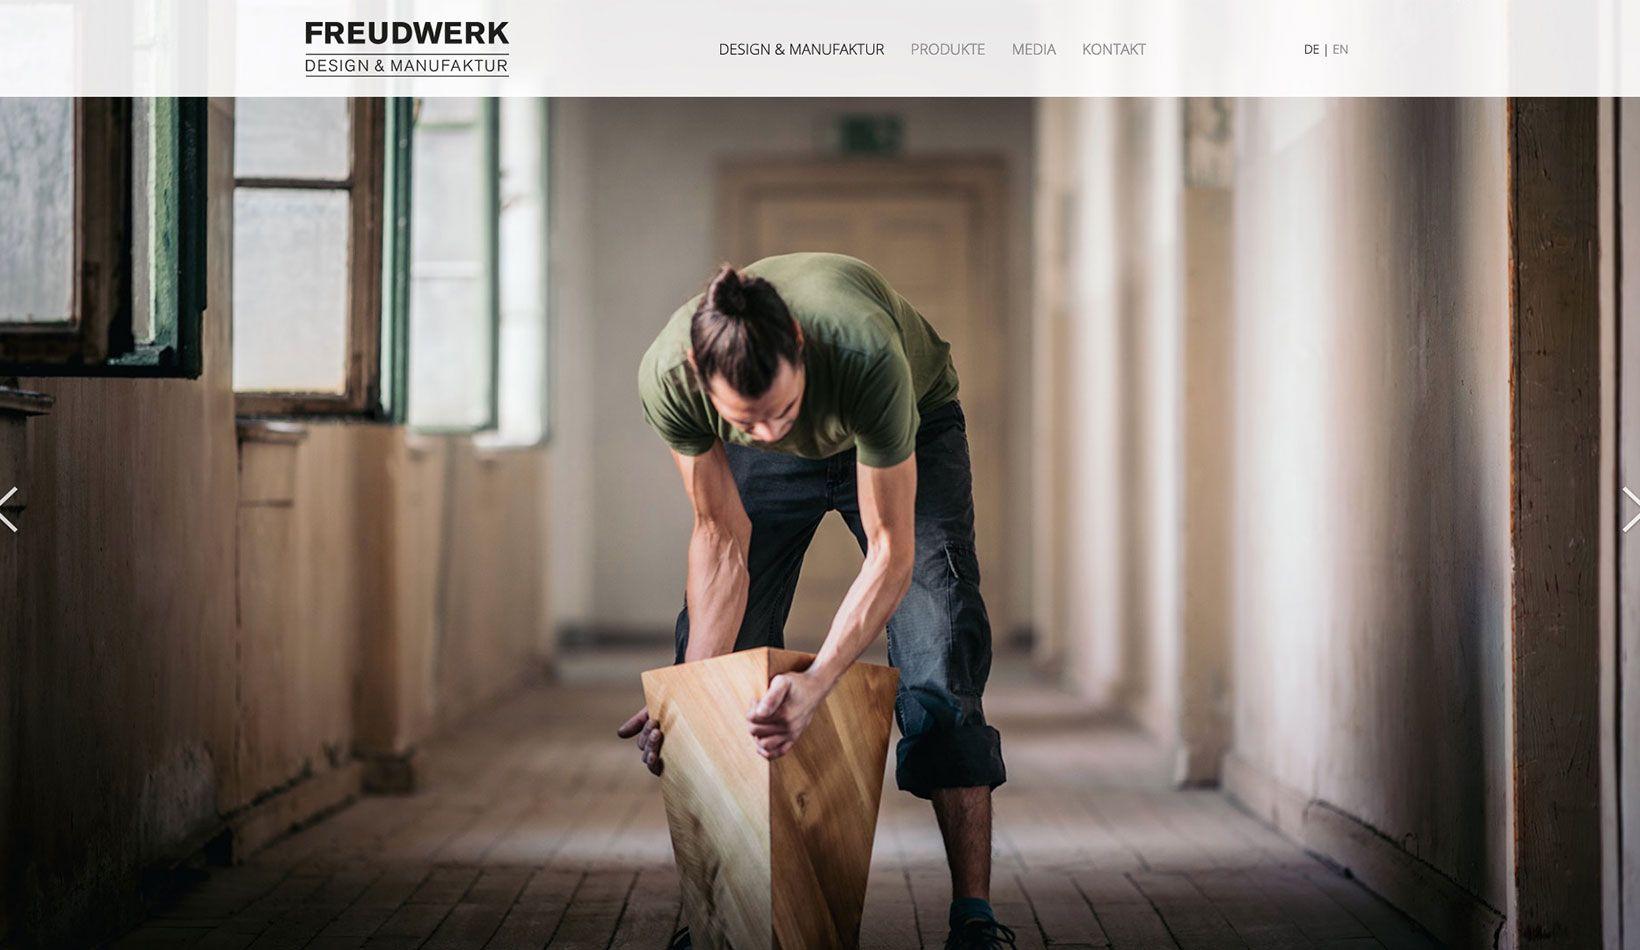 FREUDWERK - Design & Manufaktur